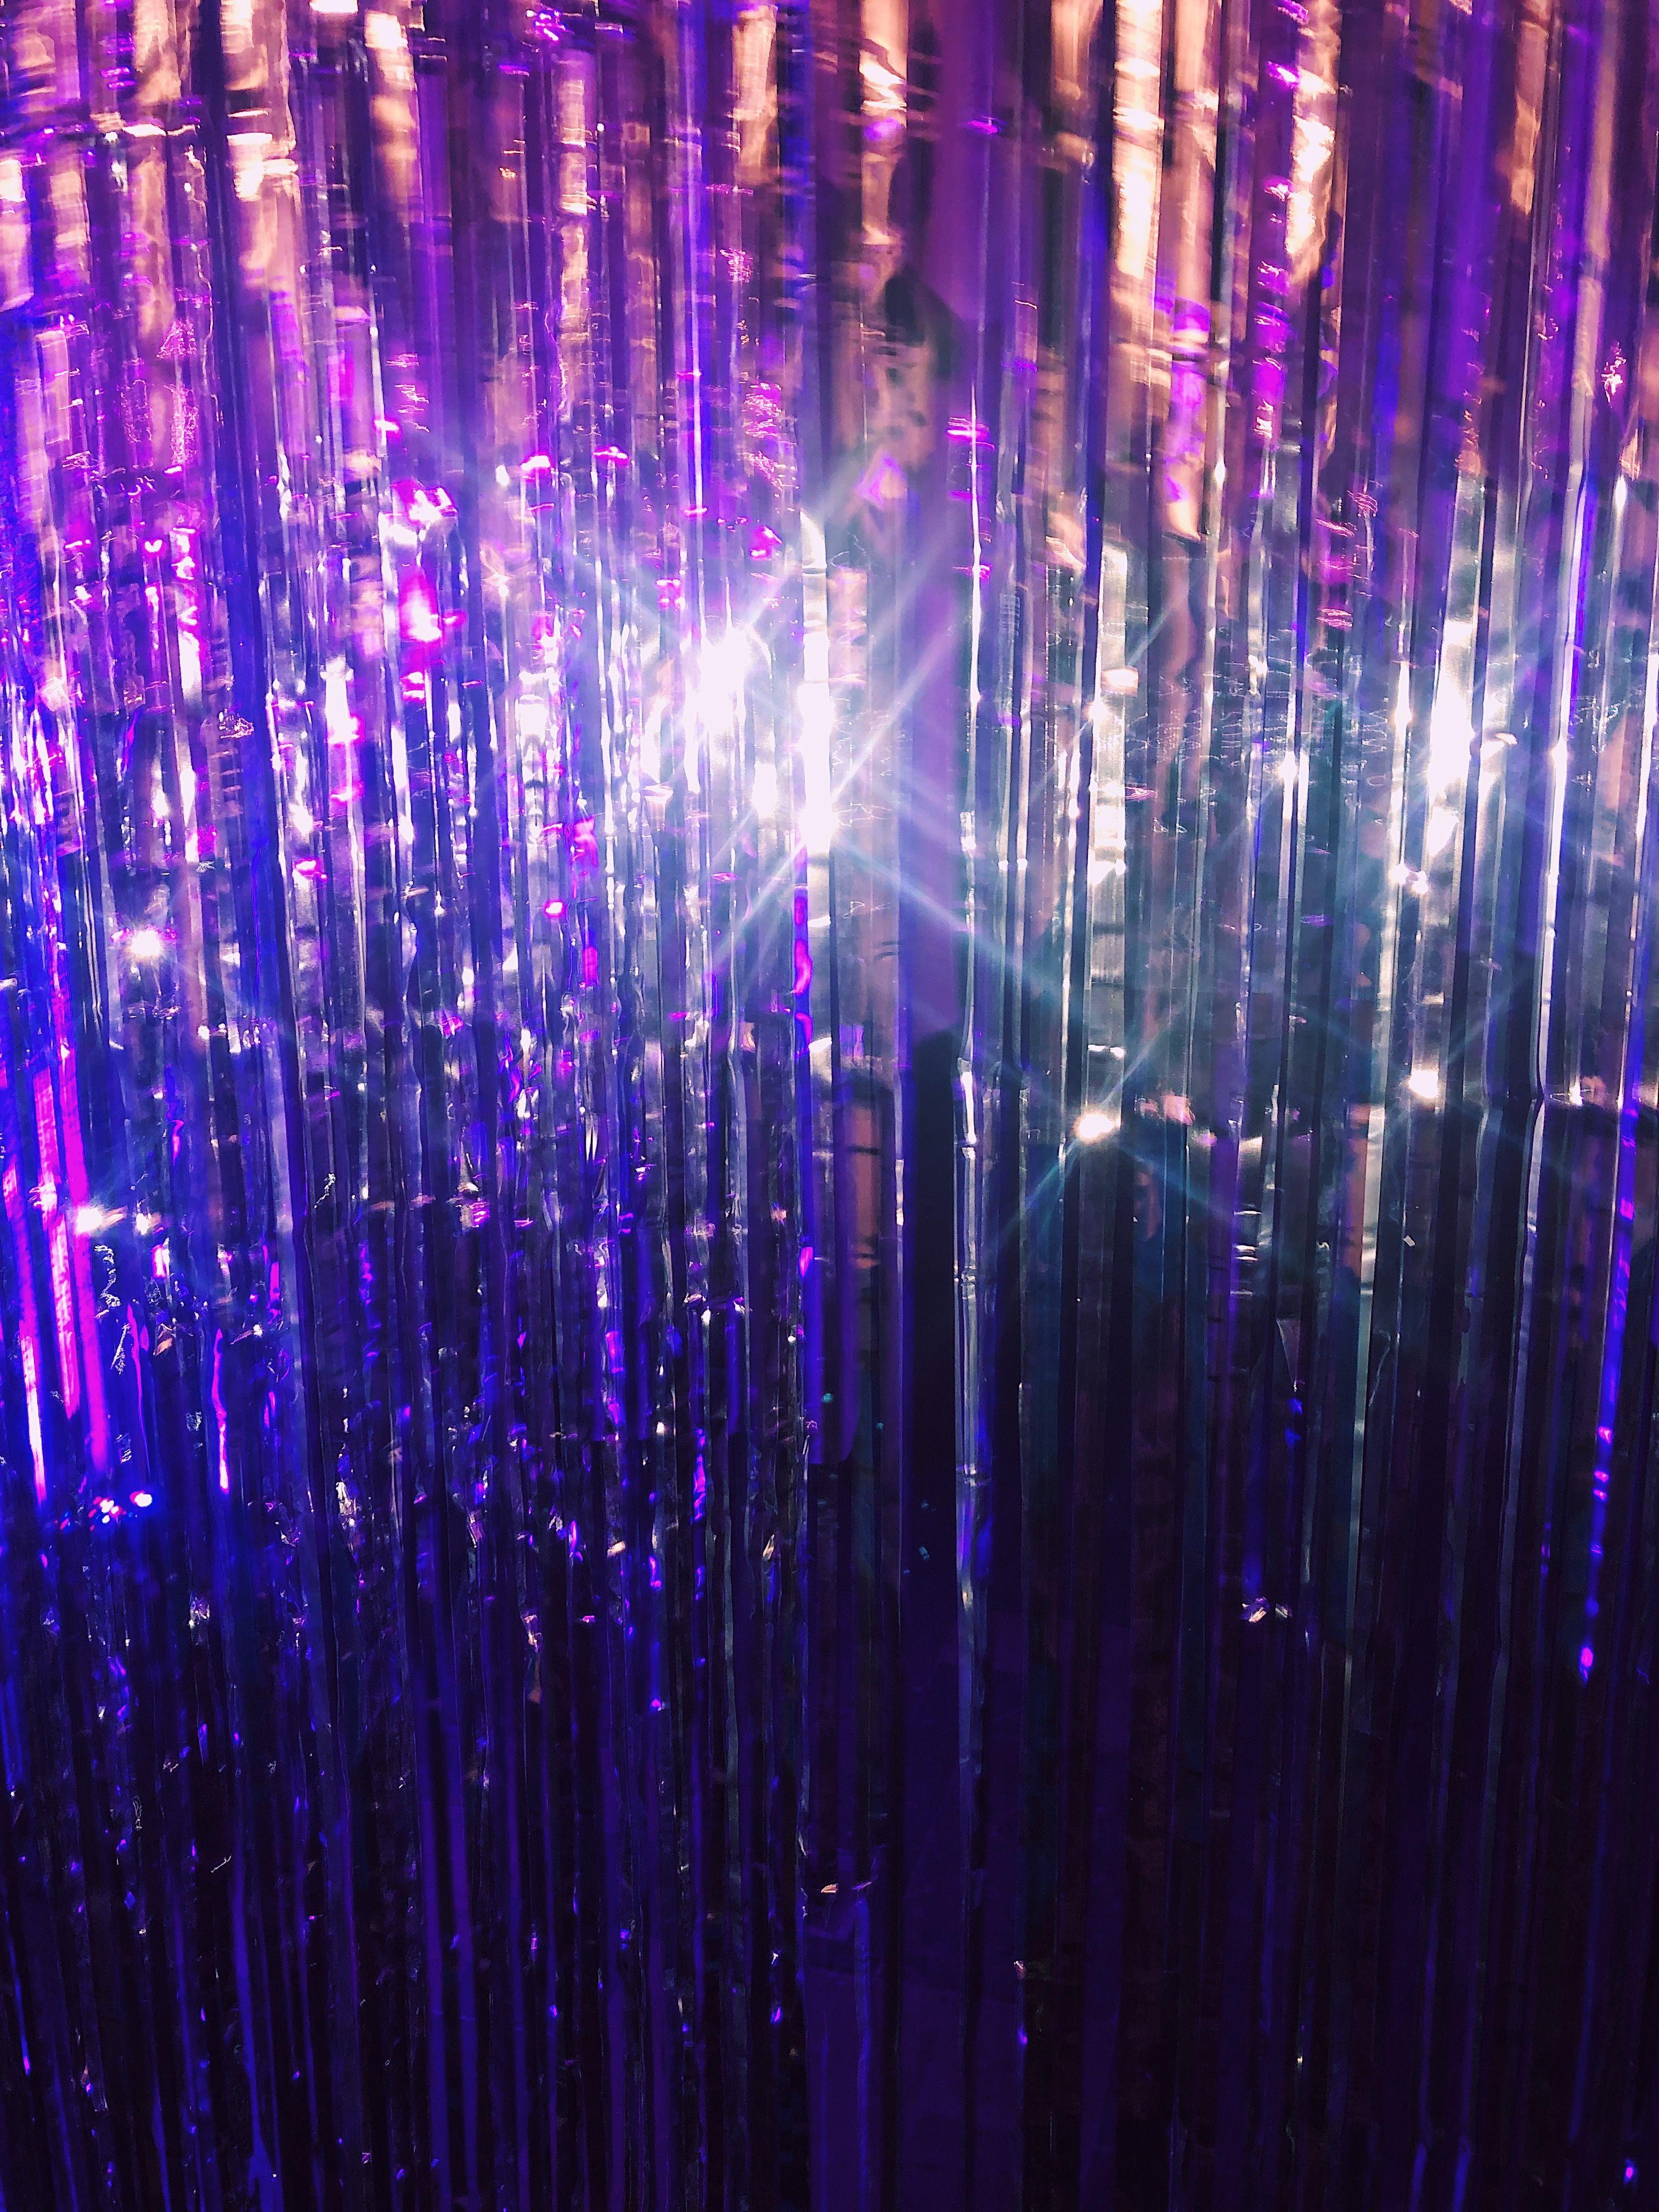 Aesthetic Shiny Purple Aesthetic Purple Glitter Shine With